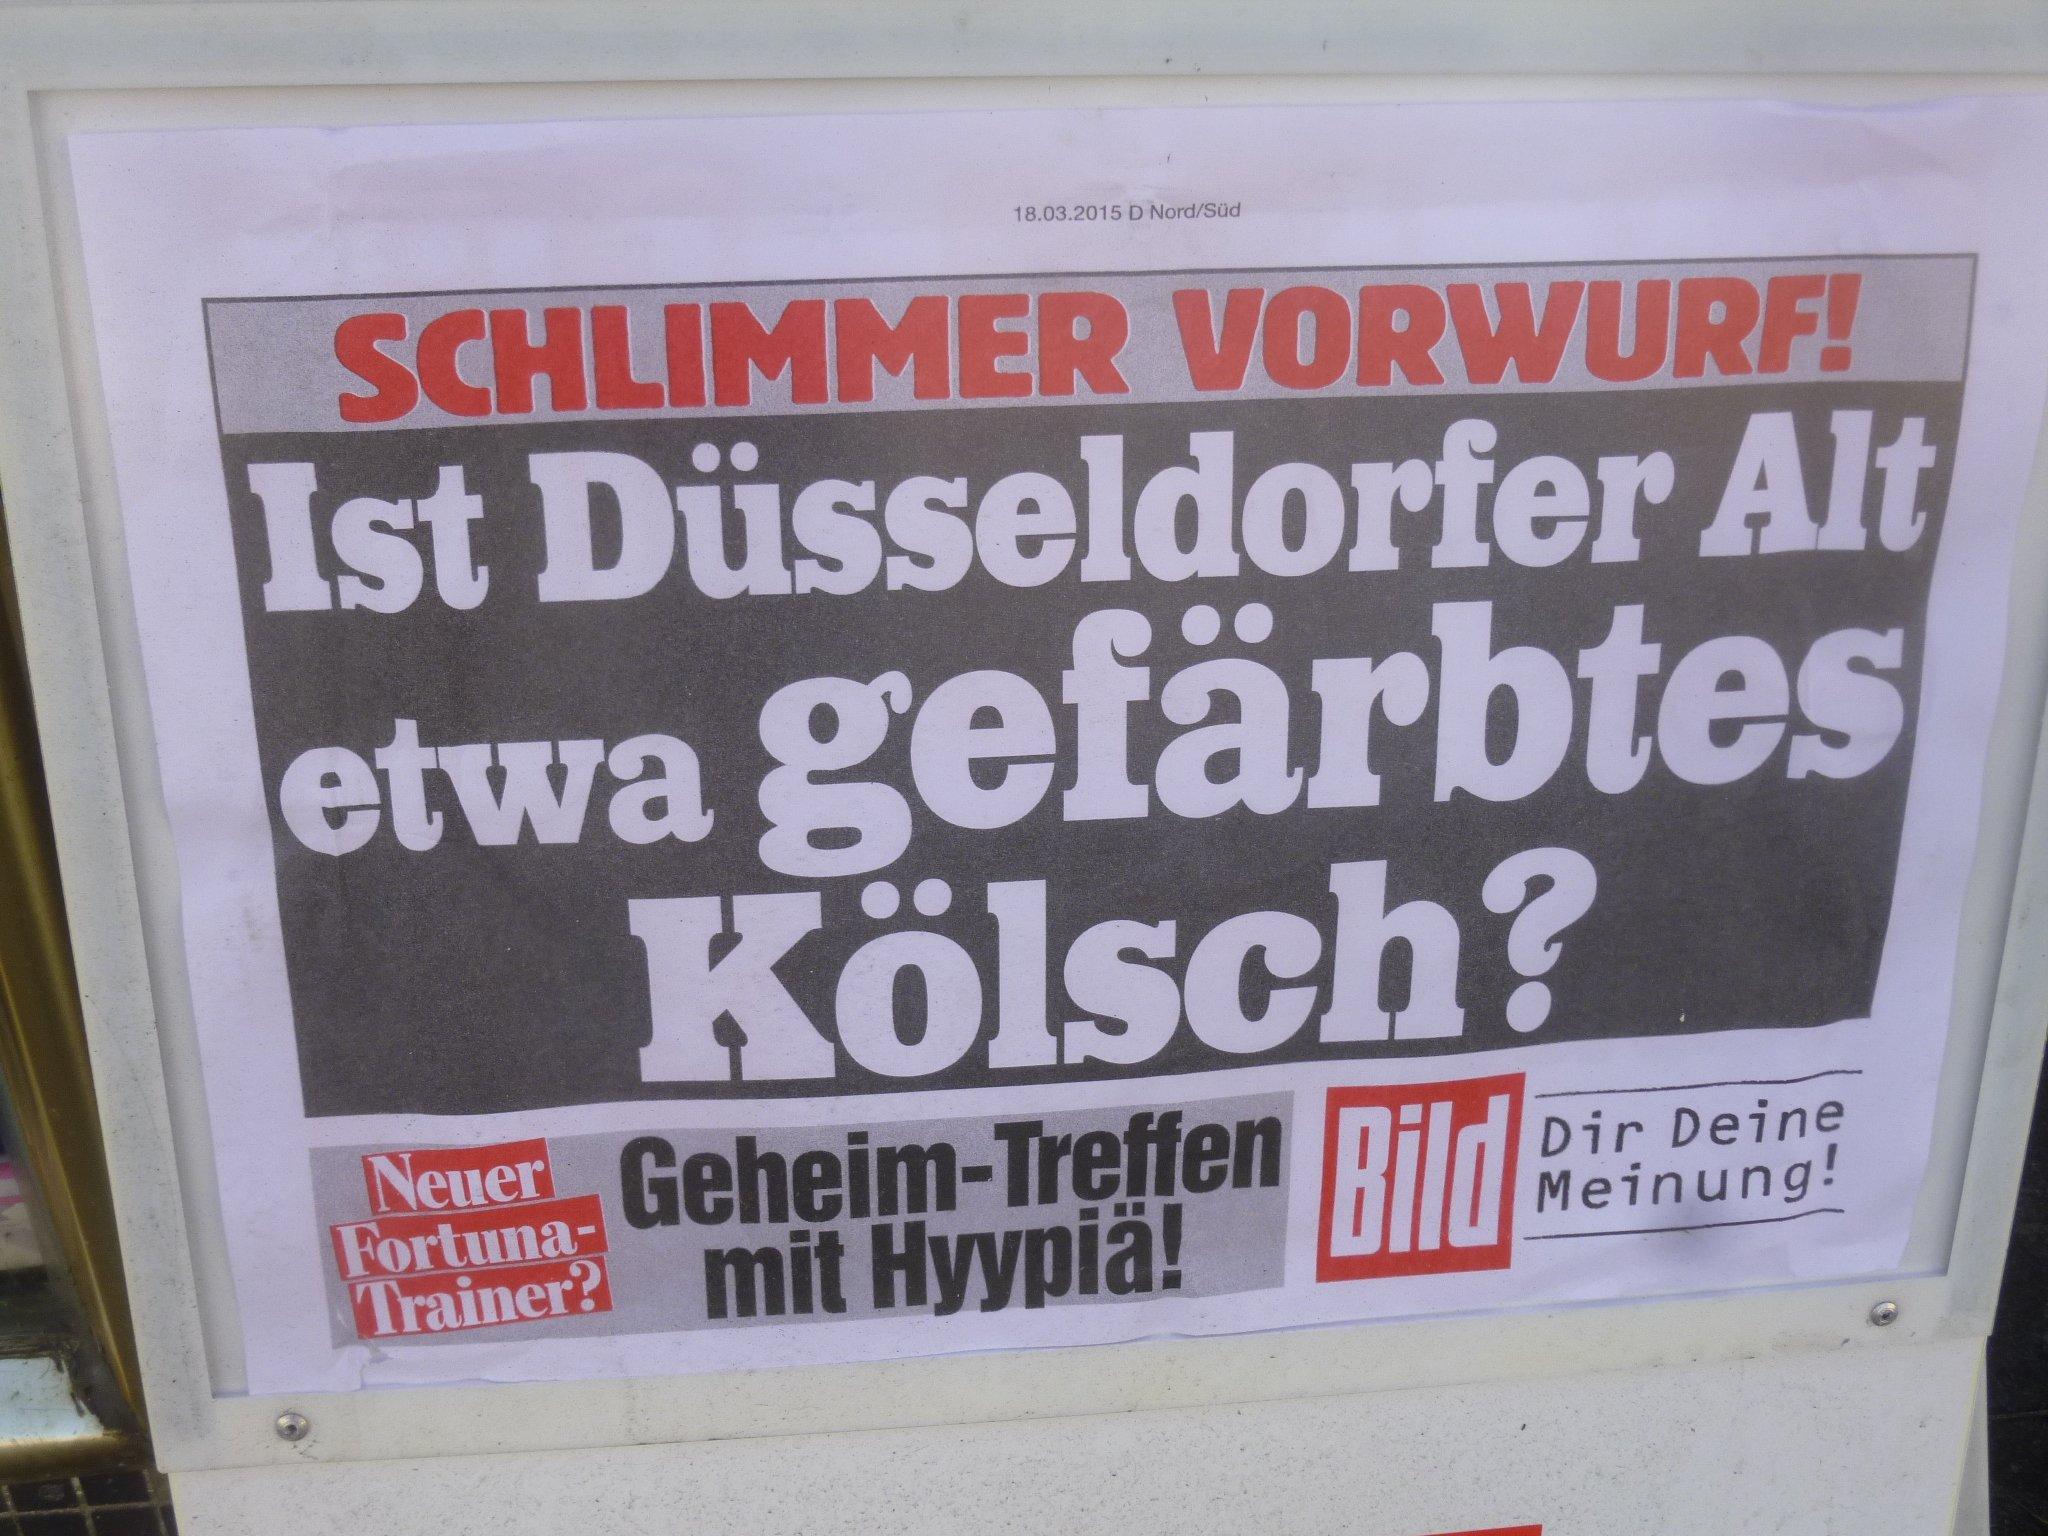 BILD Alt vs Kolsch